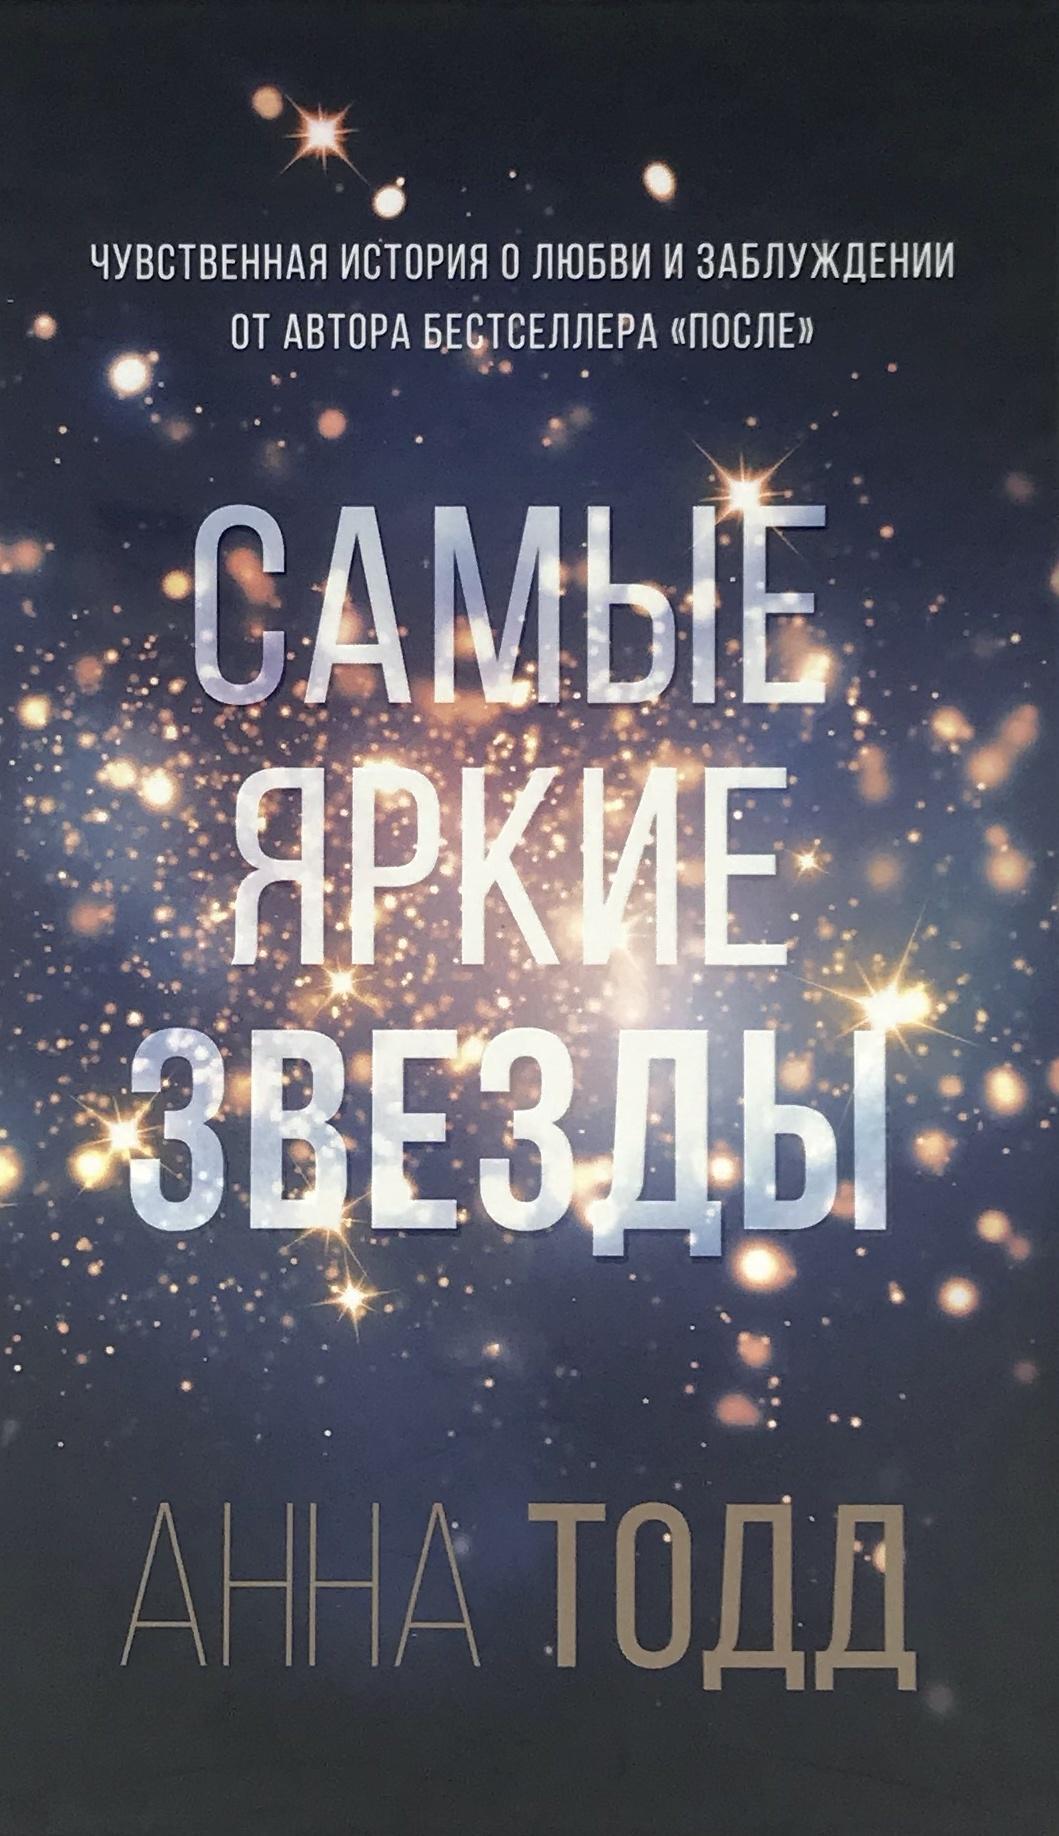 Самые яркие звёзды